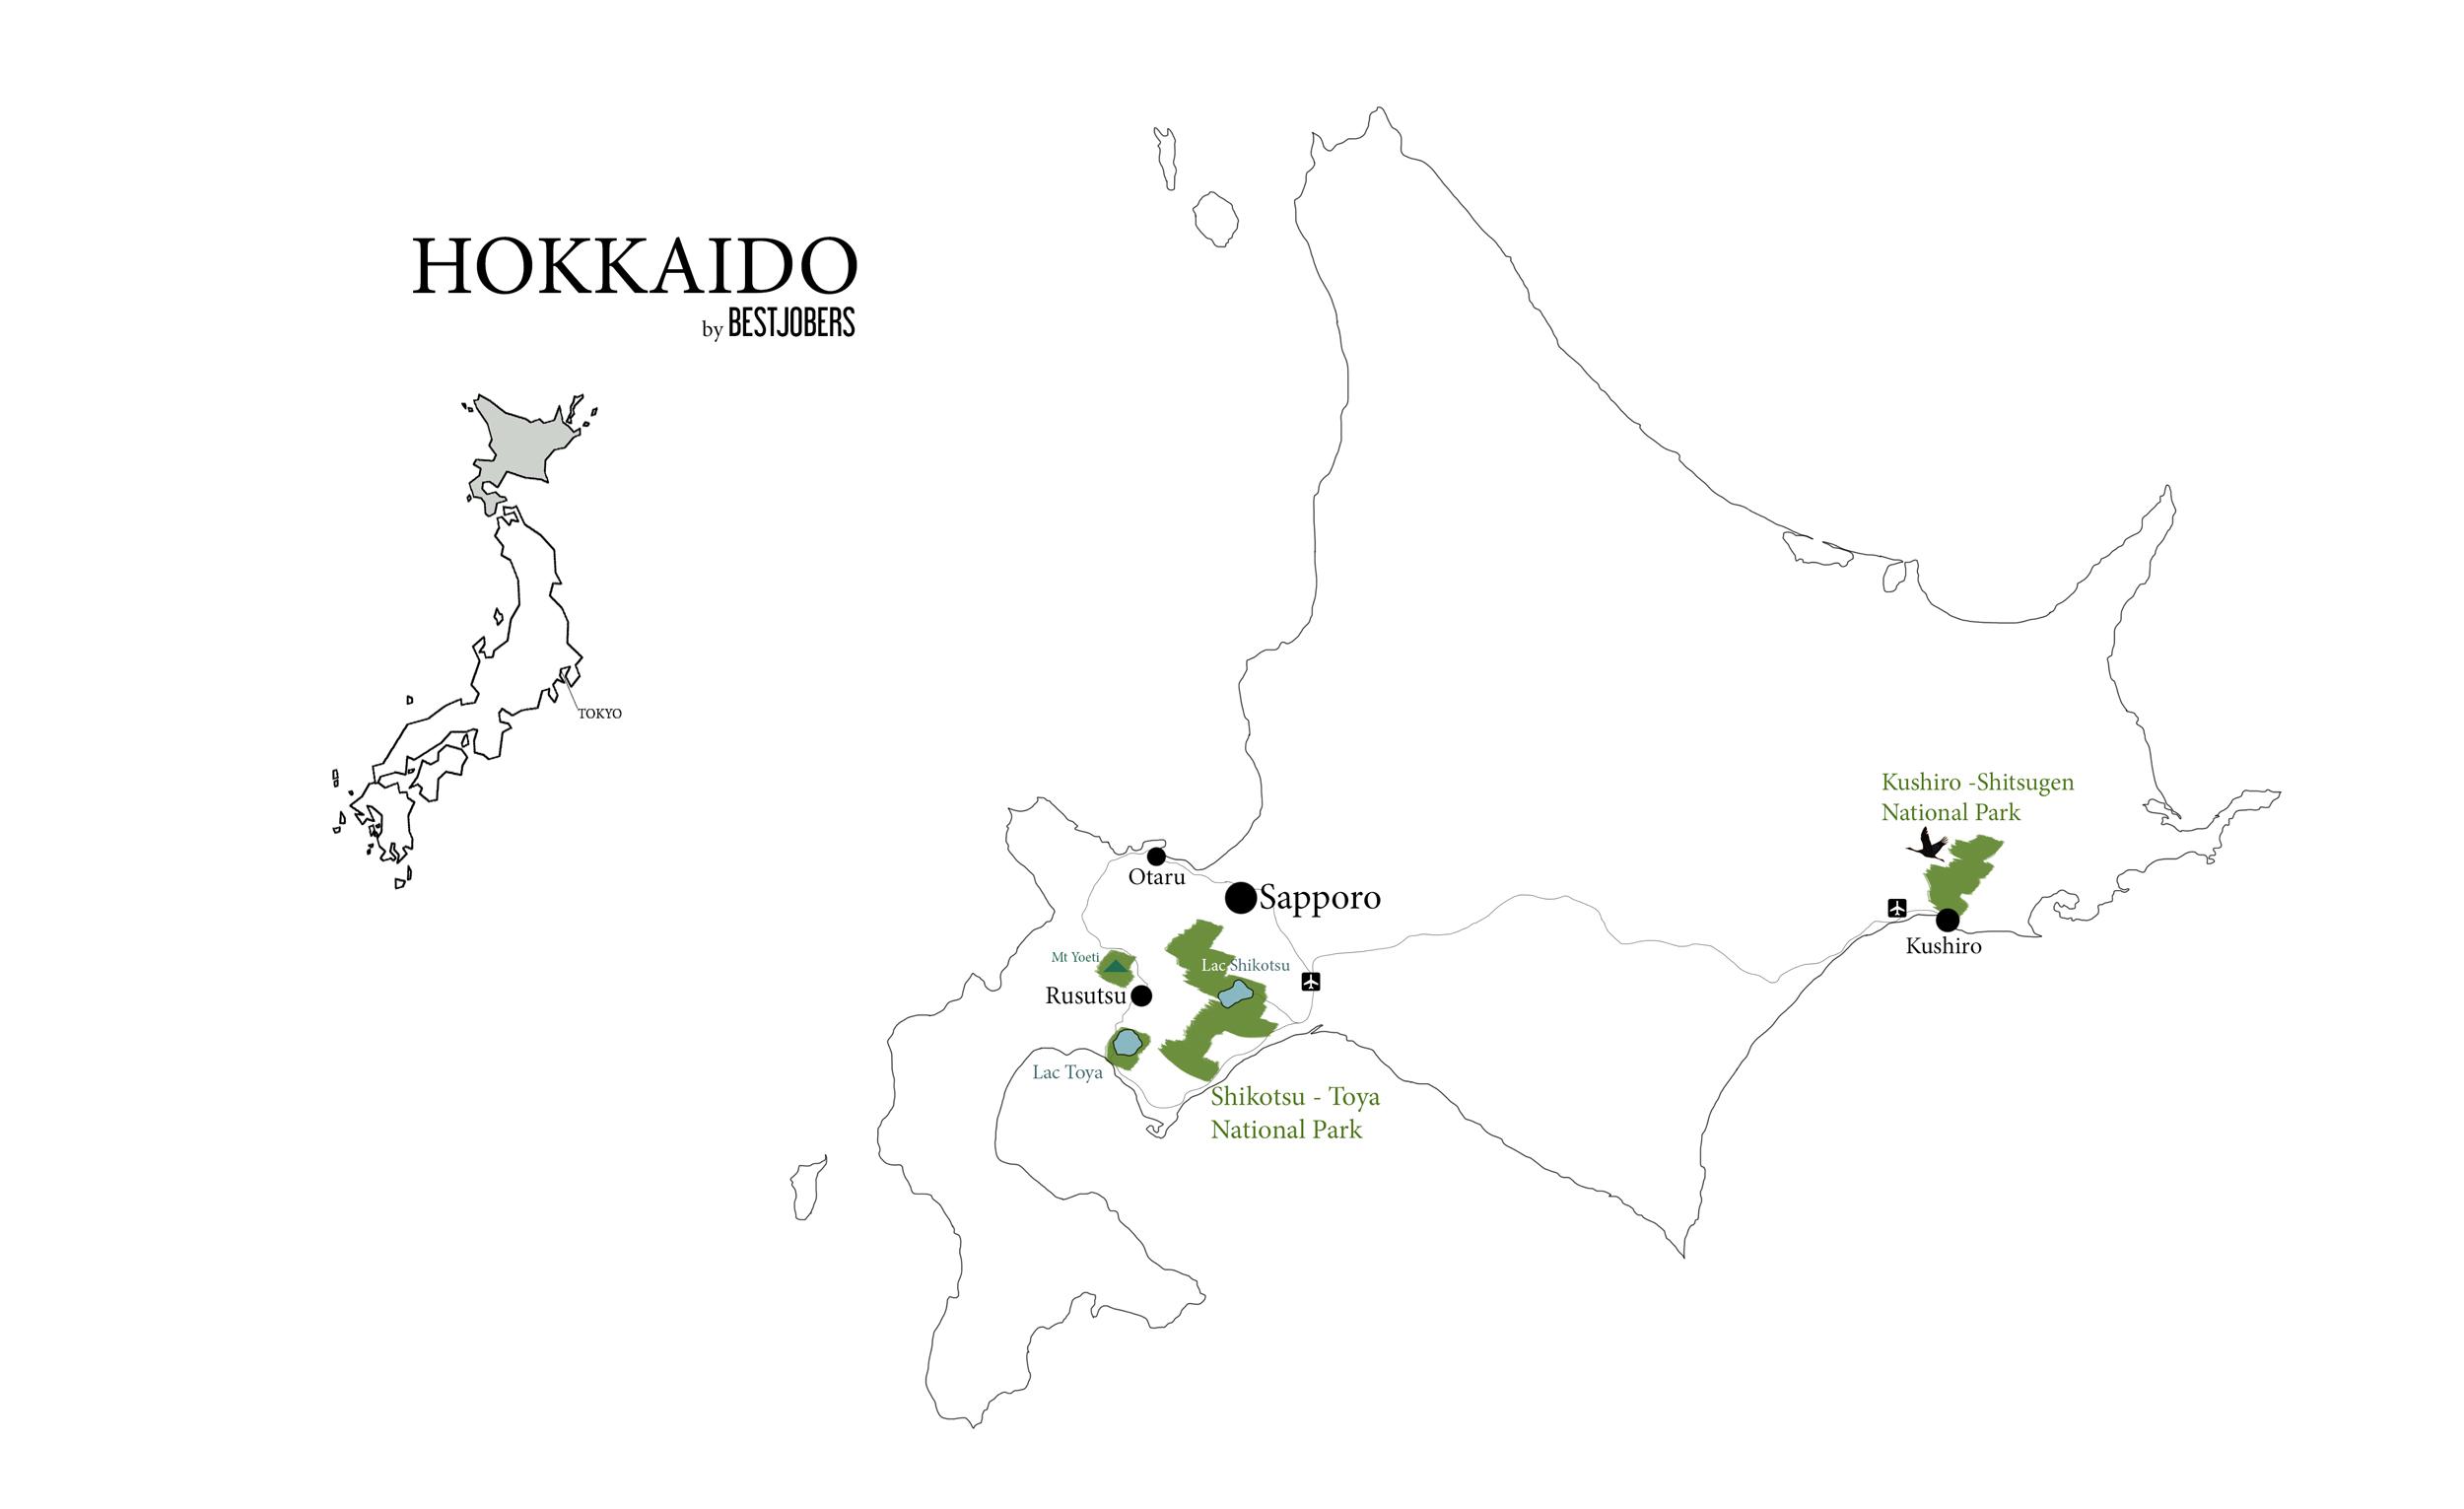 Carte Hokkaido Bestjobers